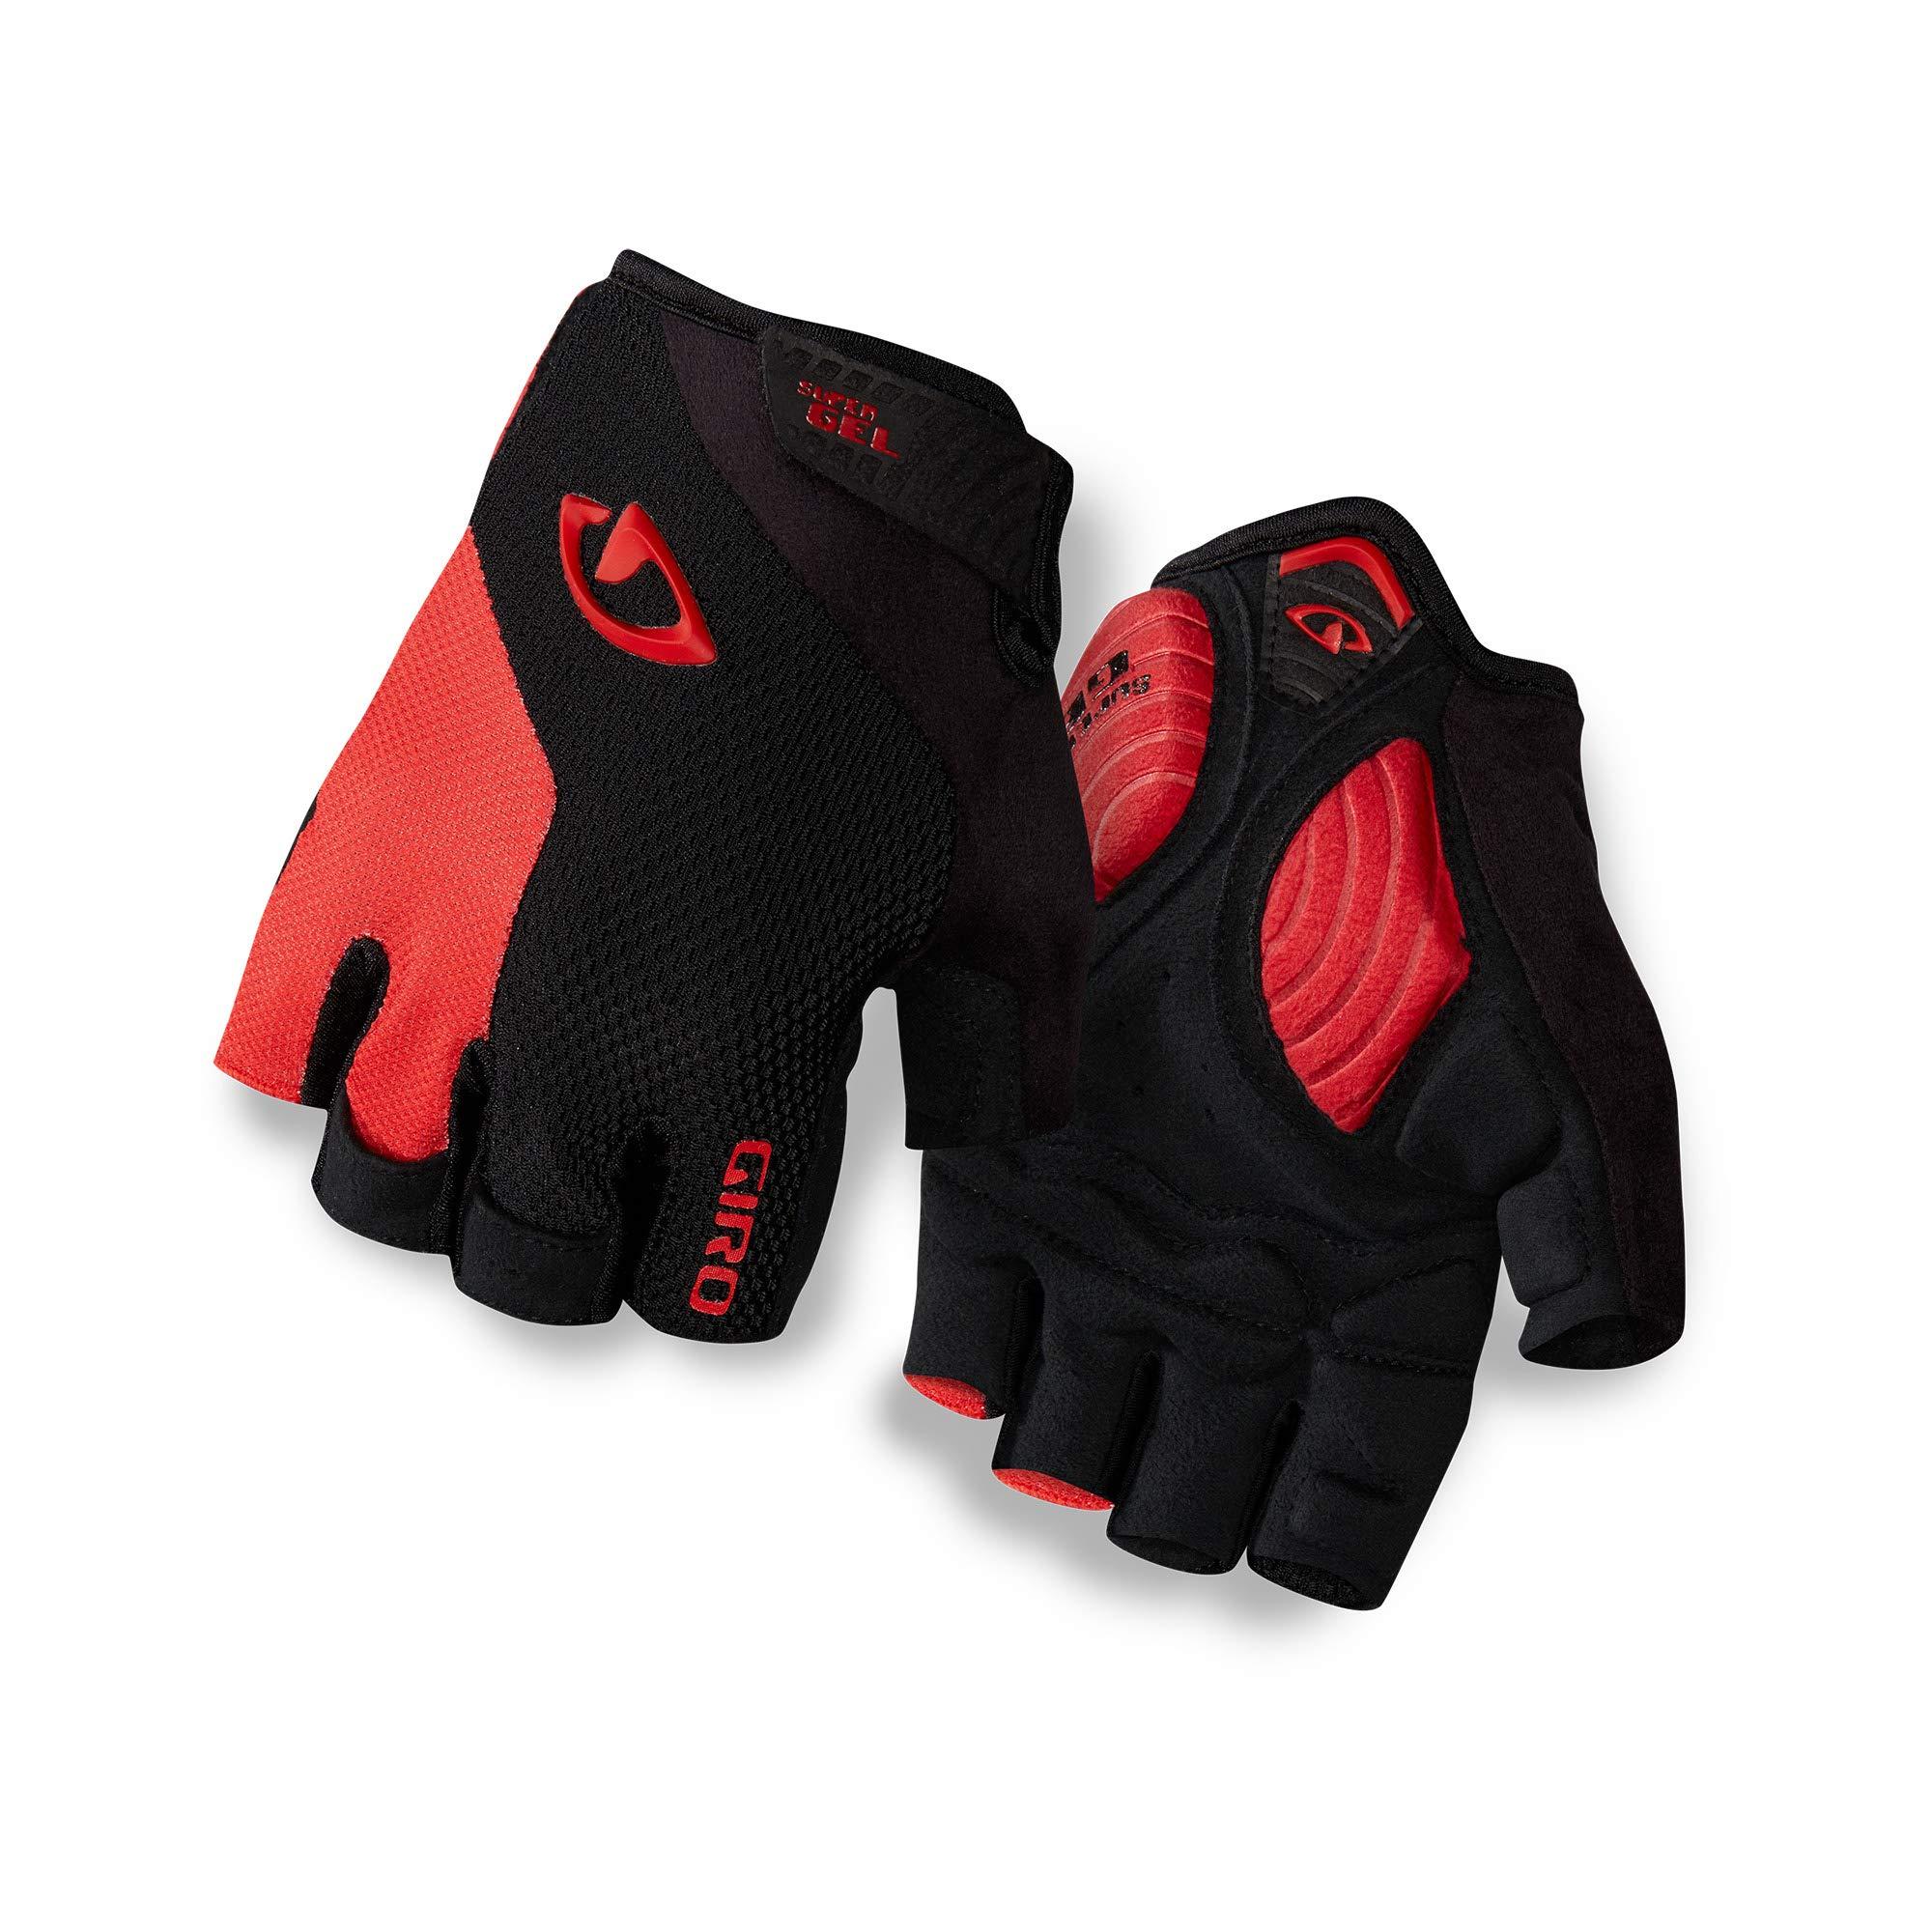 Giro Strade Dure SG Mens Road Cycling Gloves